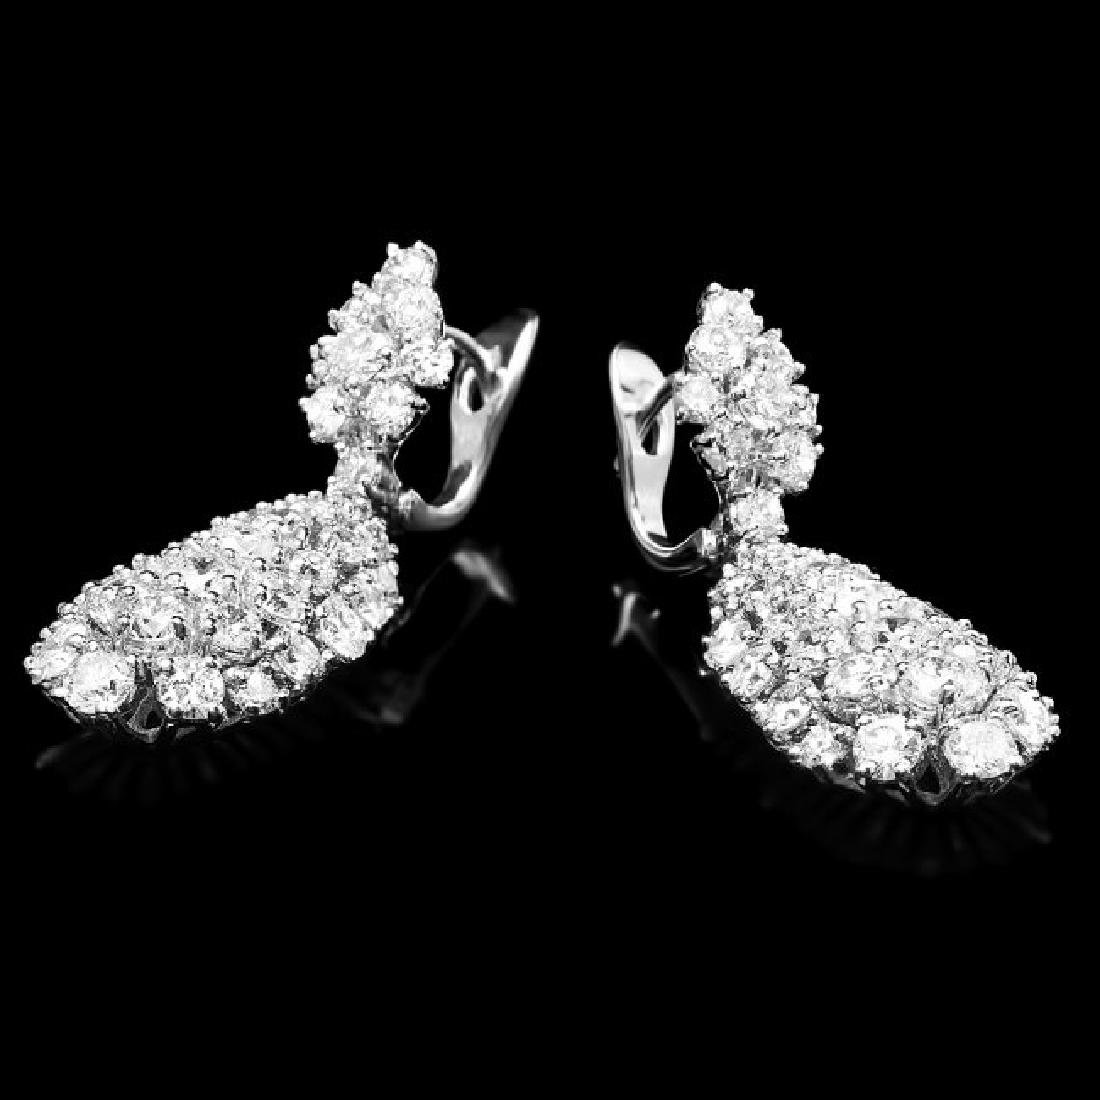 14k Gold 5.32ct Diamond Earrings - 2